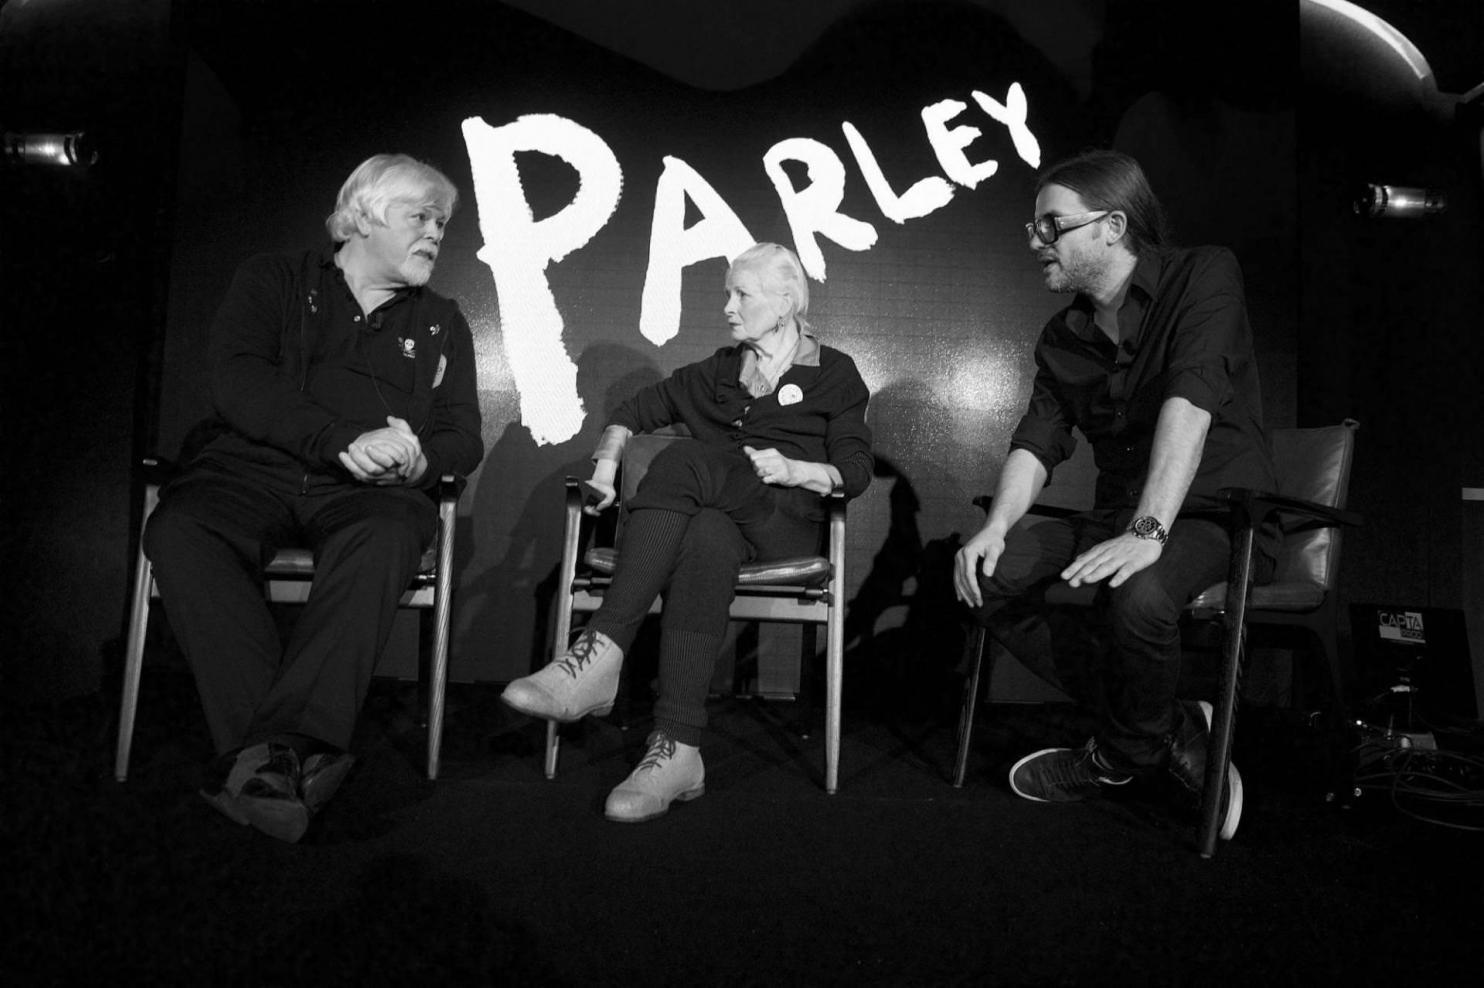 Paul Watson, Vivienne Westwood and Cyrill Gutsch